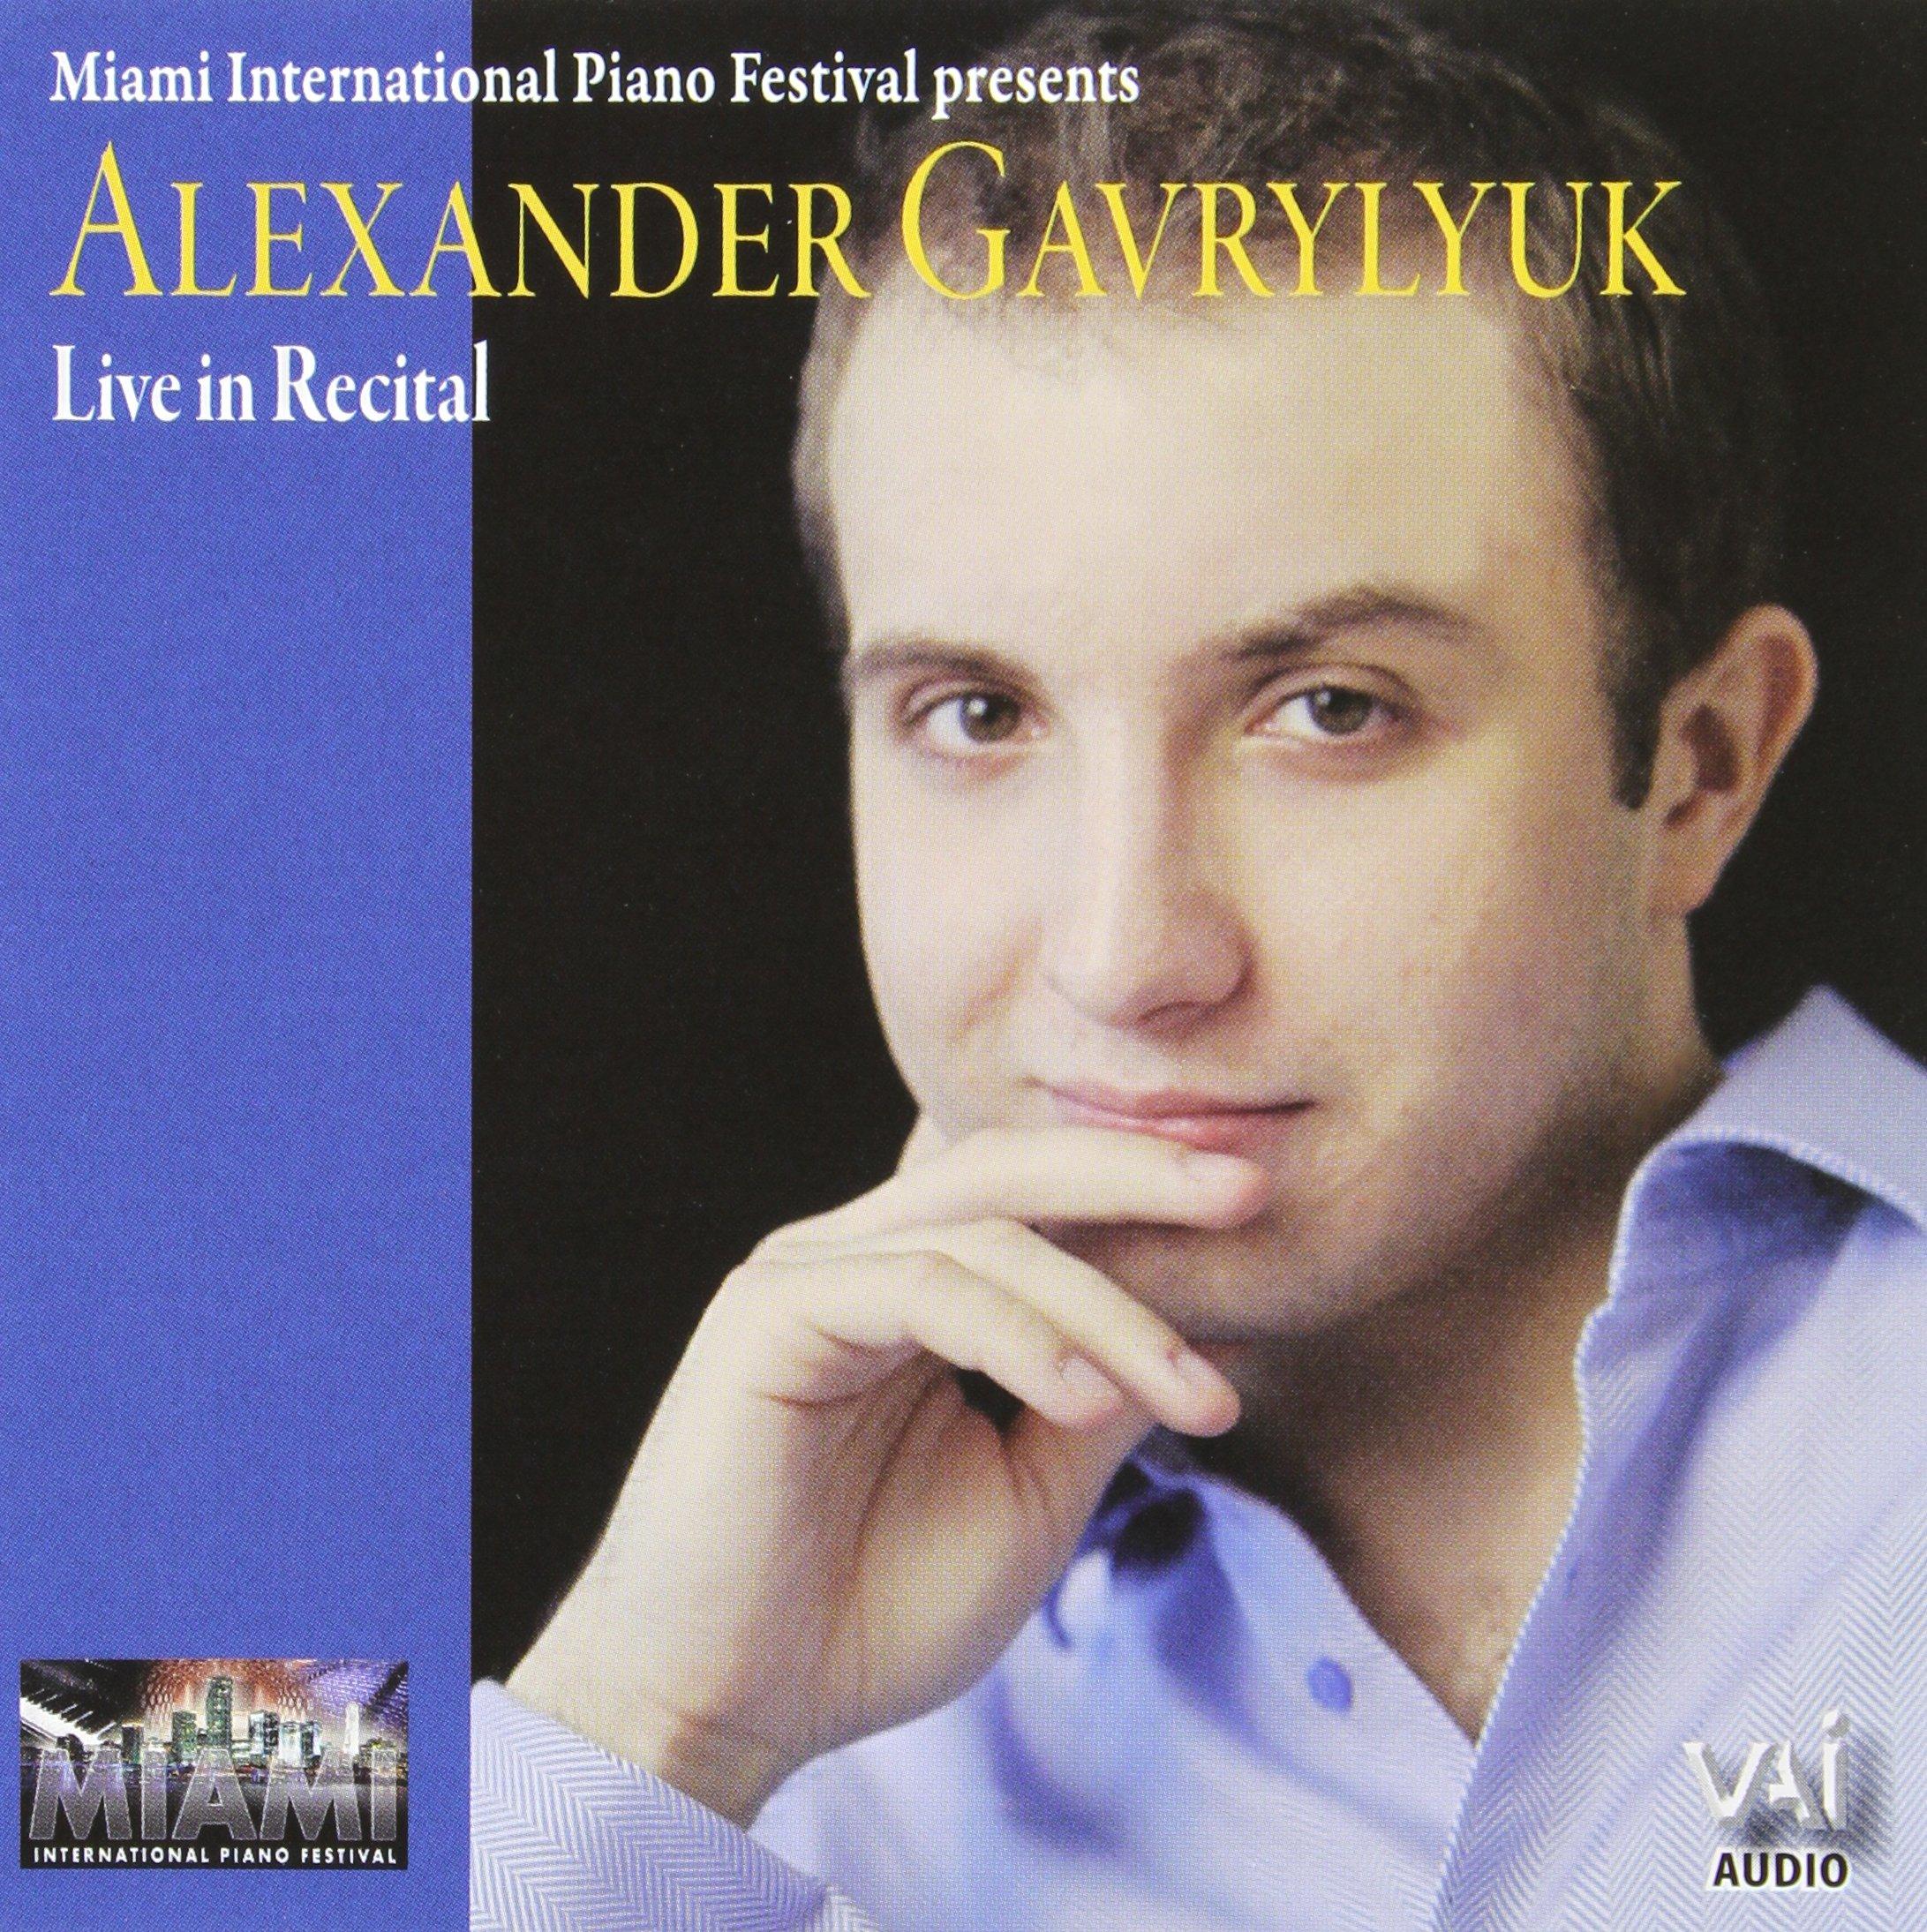 Alexander Gavrylyuk: Live in Recital by Unknown